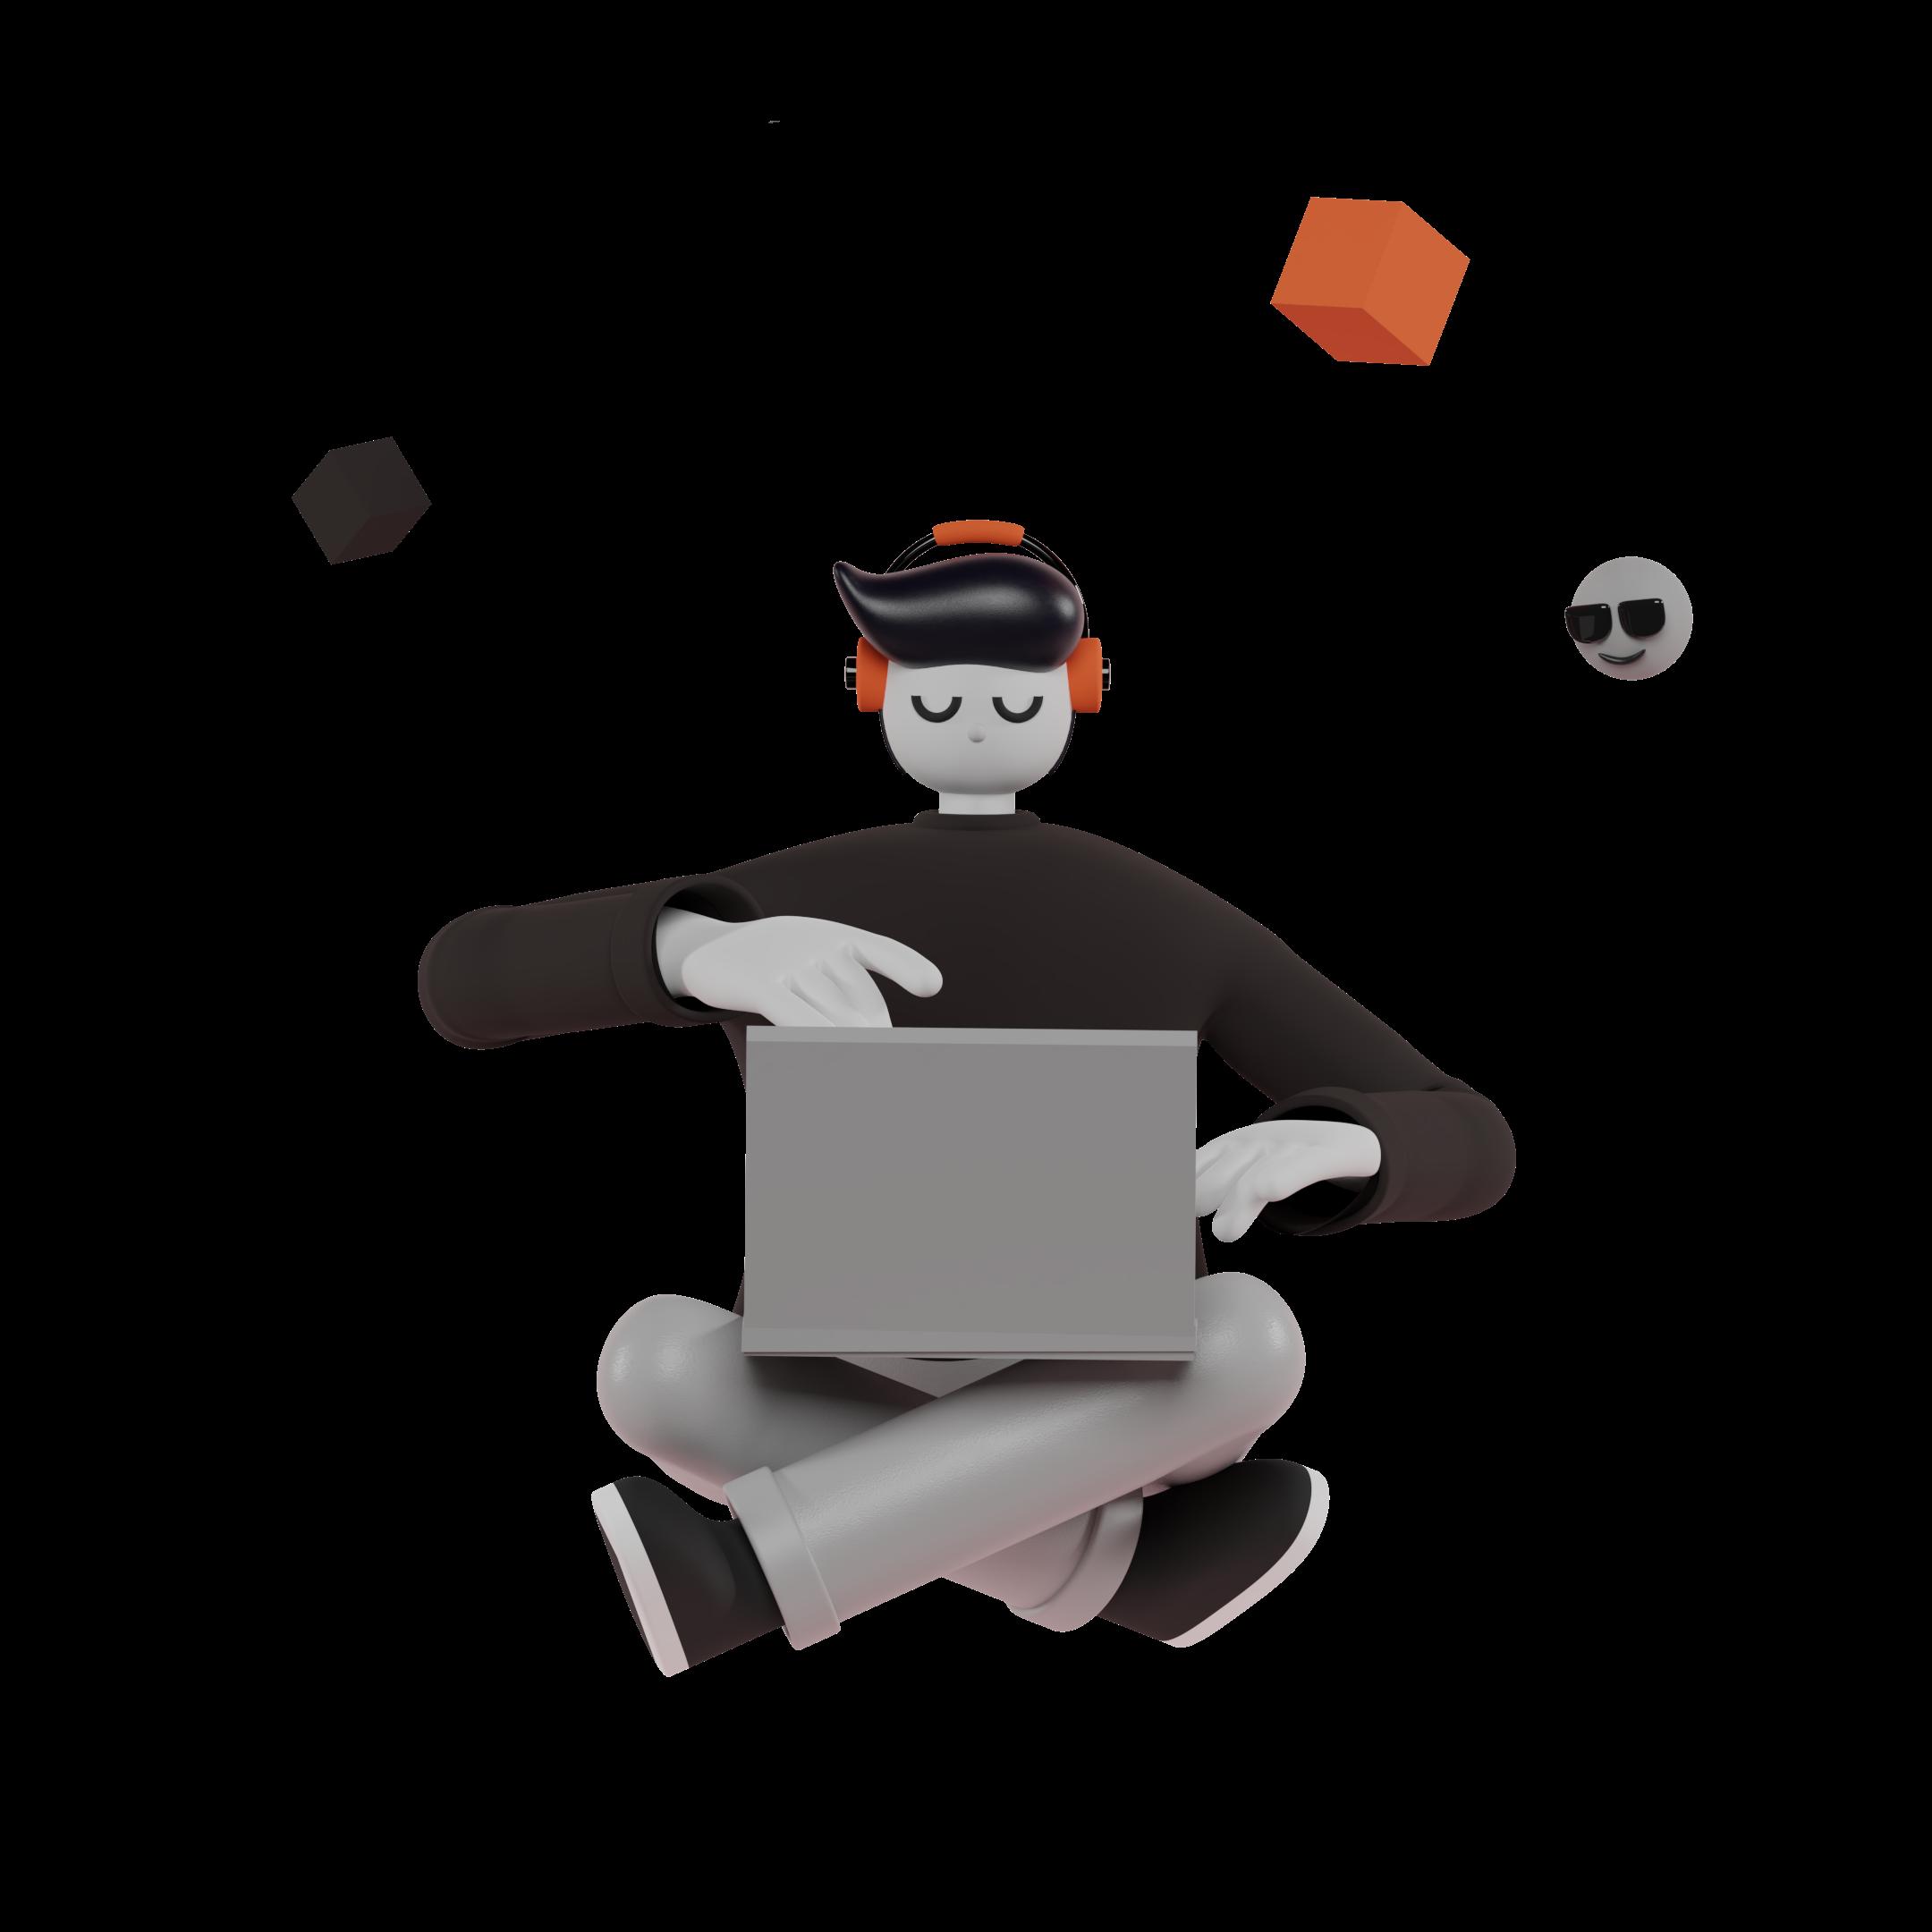 Saly 3d illustration